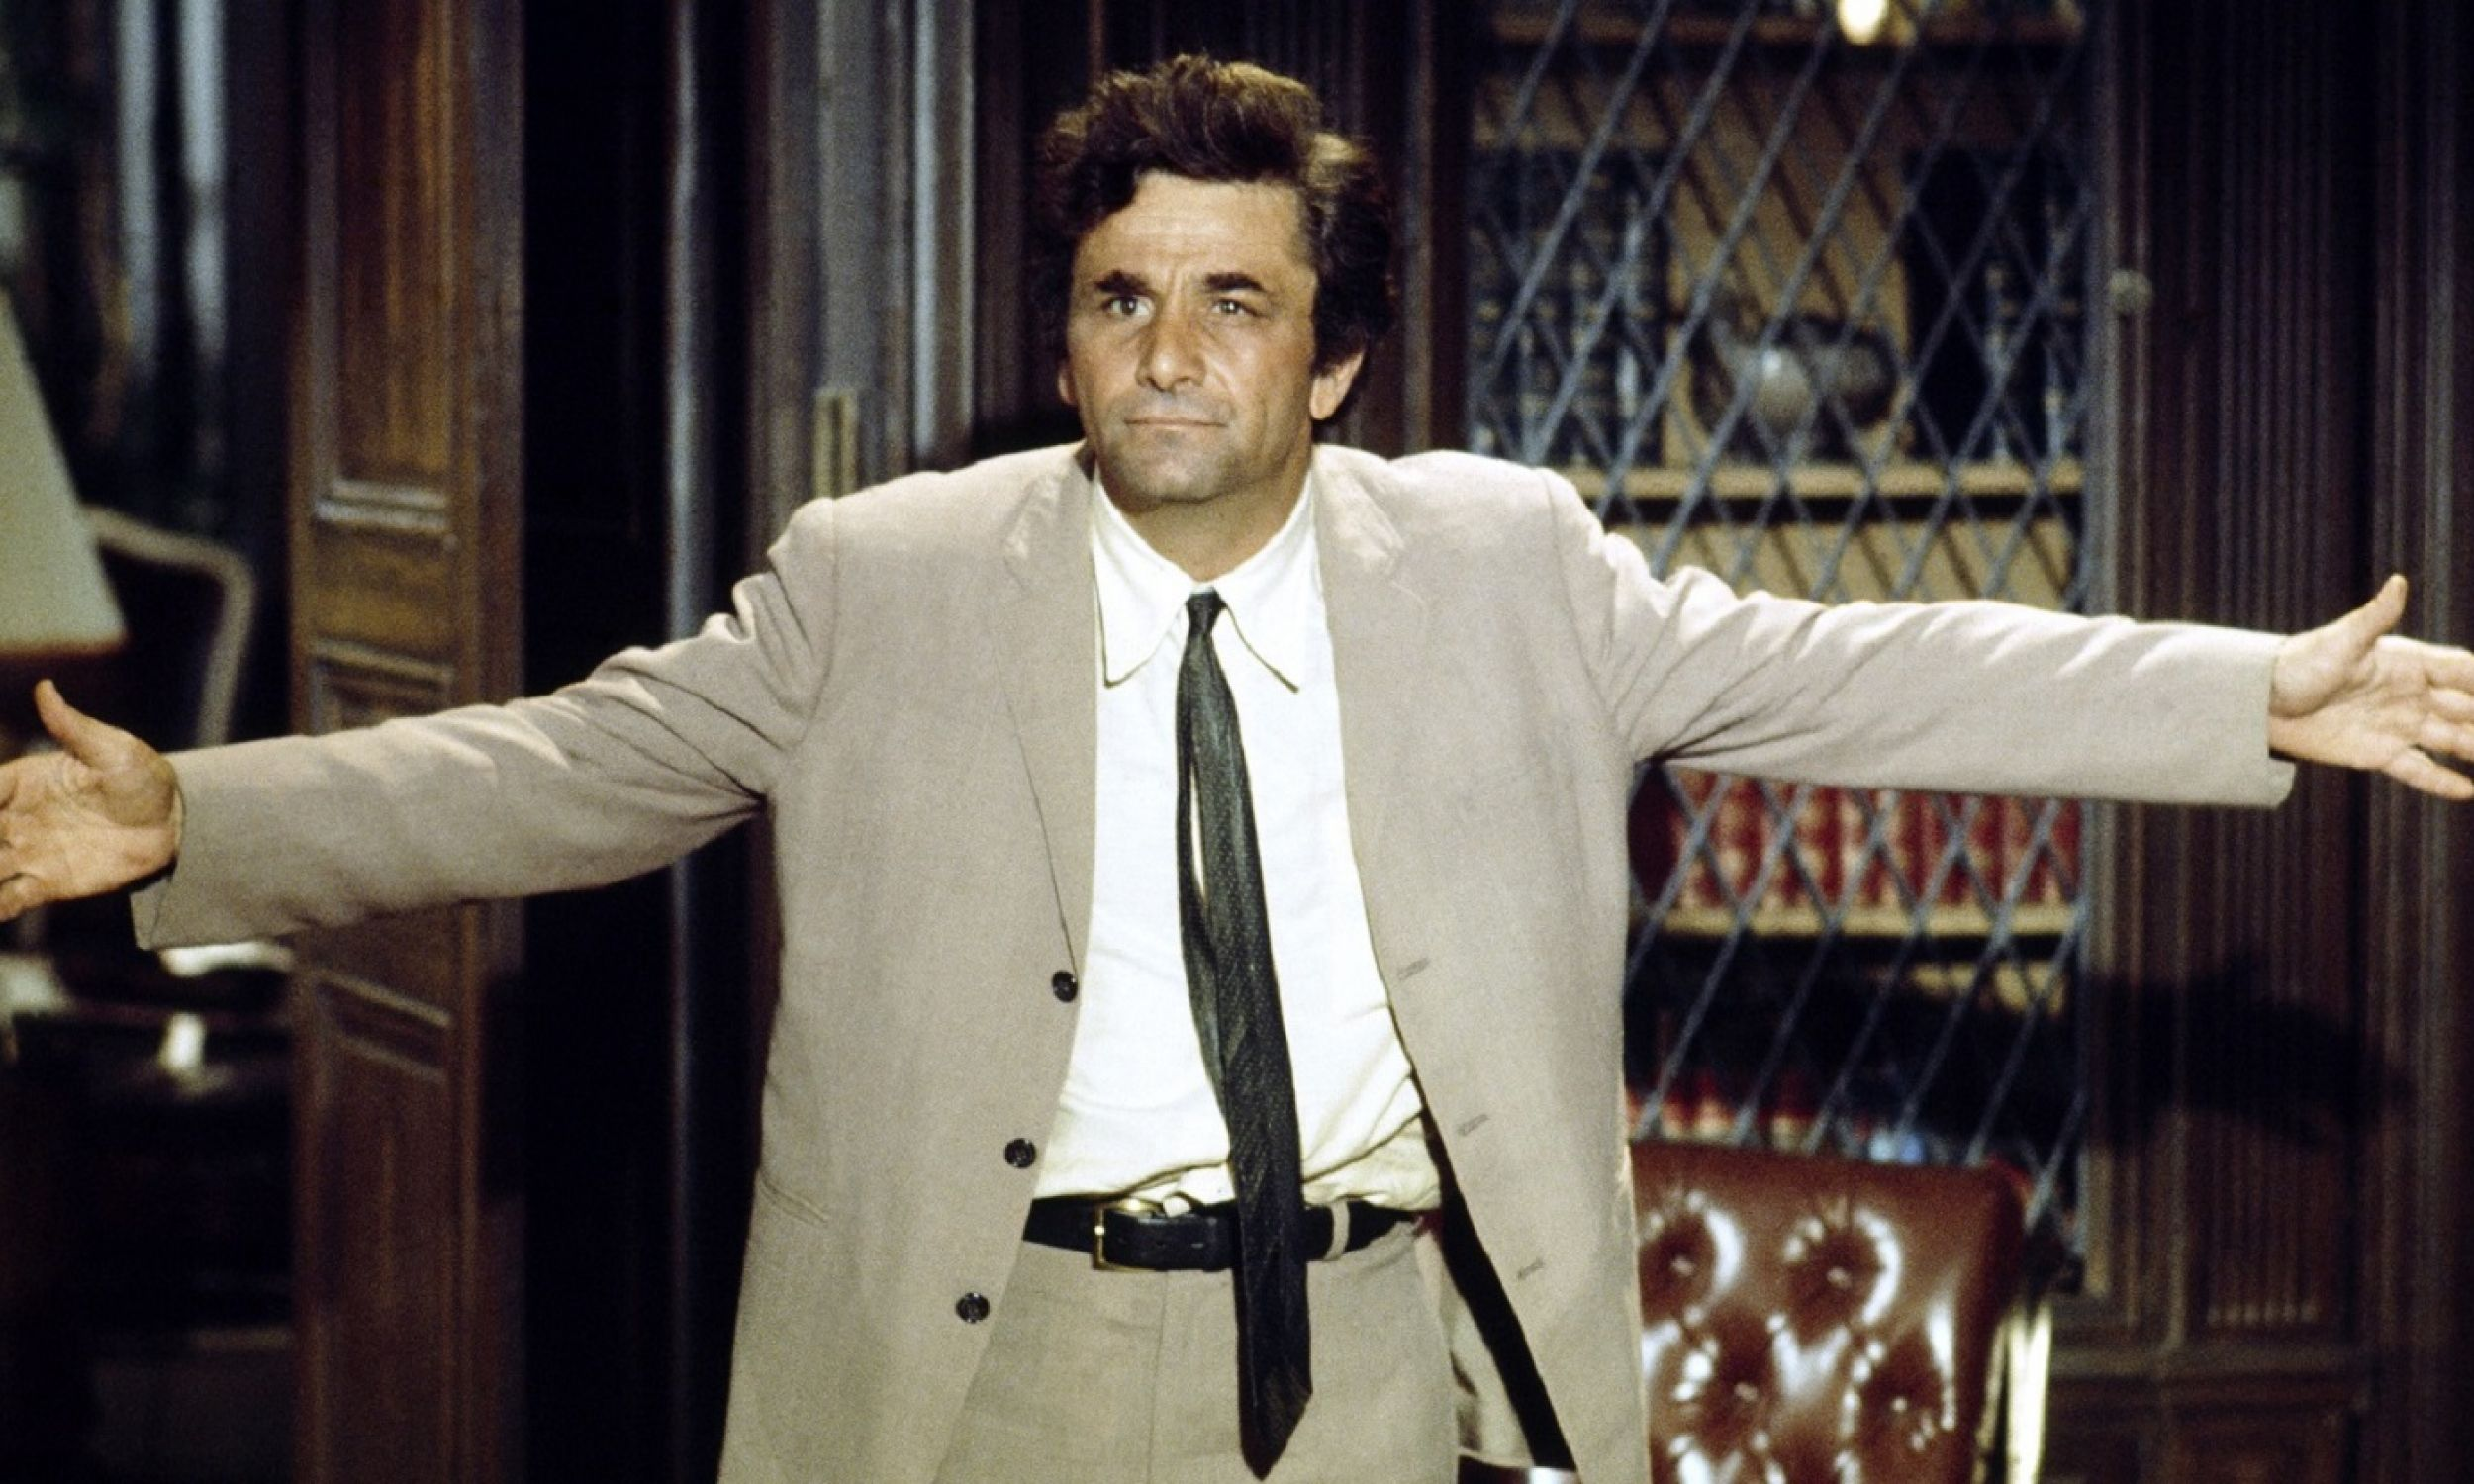 Aktor i komik Peter Falk (1927-2011)  jako porucznik Columbo. Fot. NBCU Photo Bank/NBCUniversal via Getty Images via Getty Images